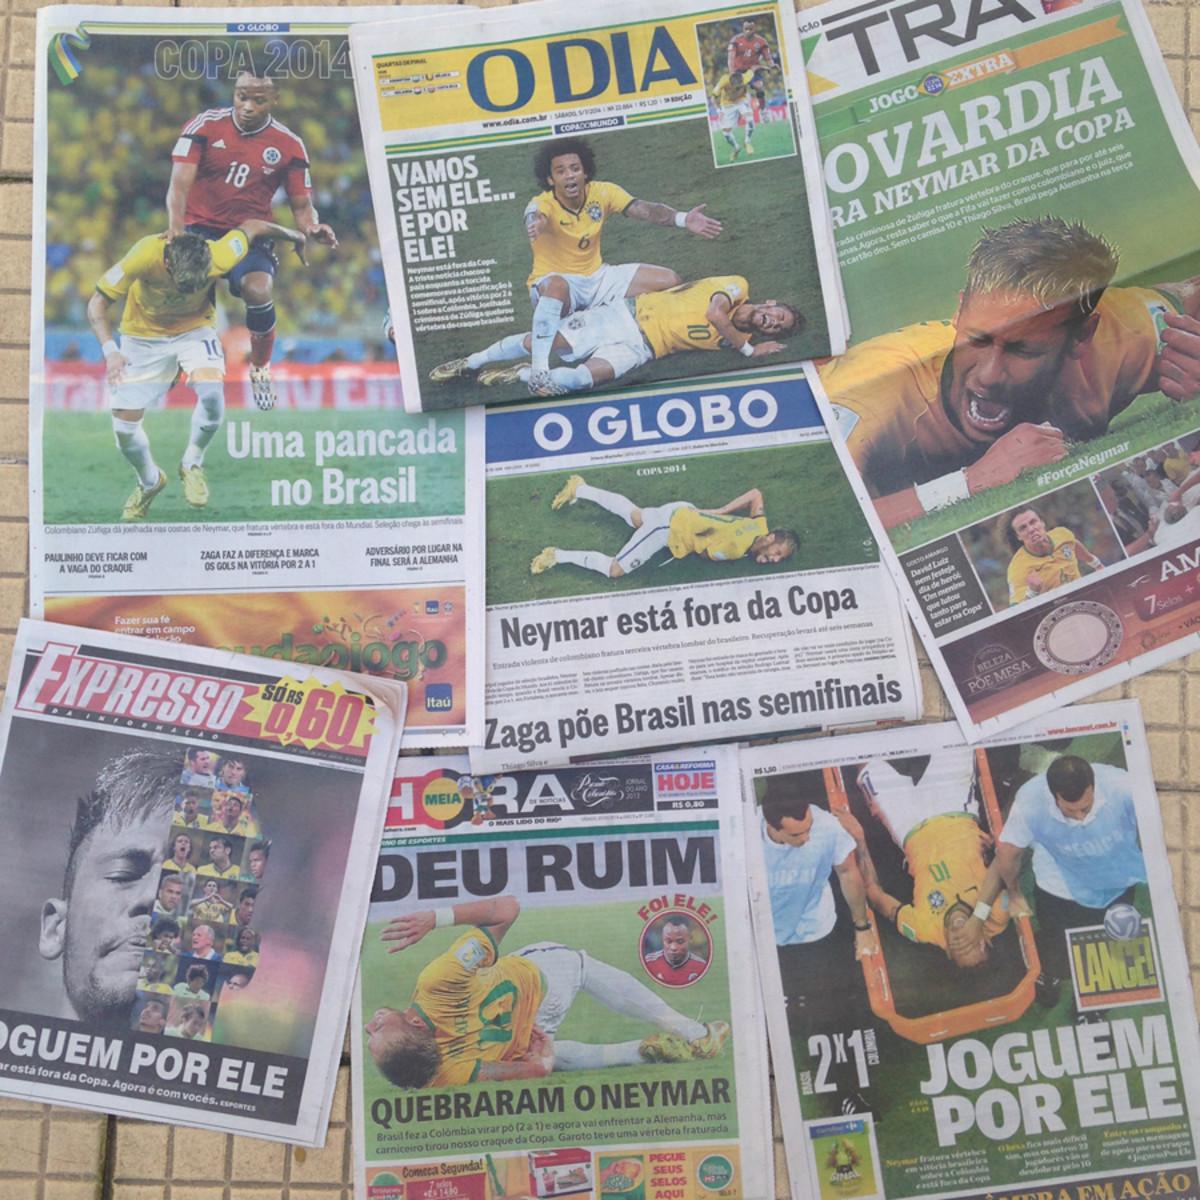 Neymar-Newspapers-All